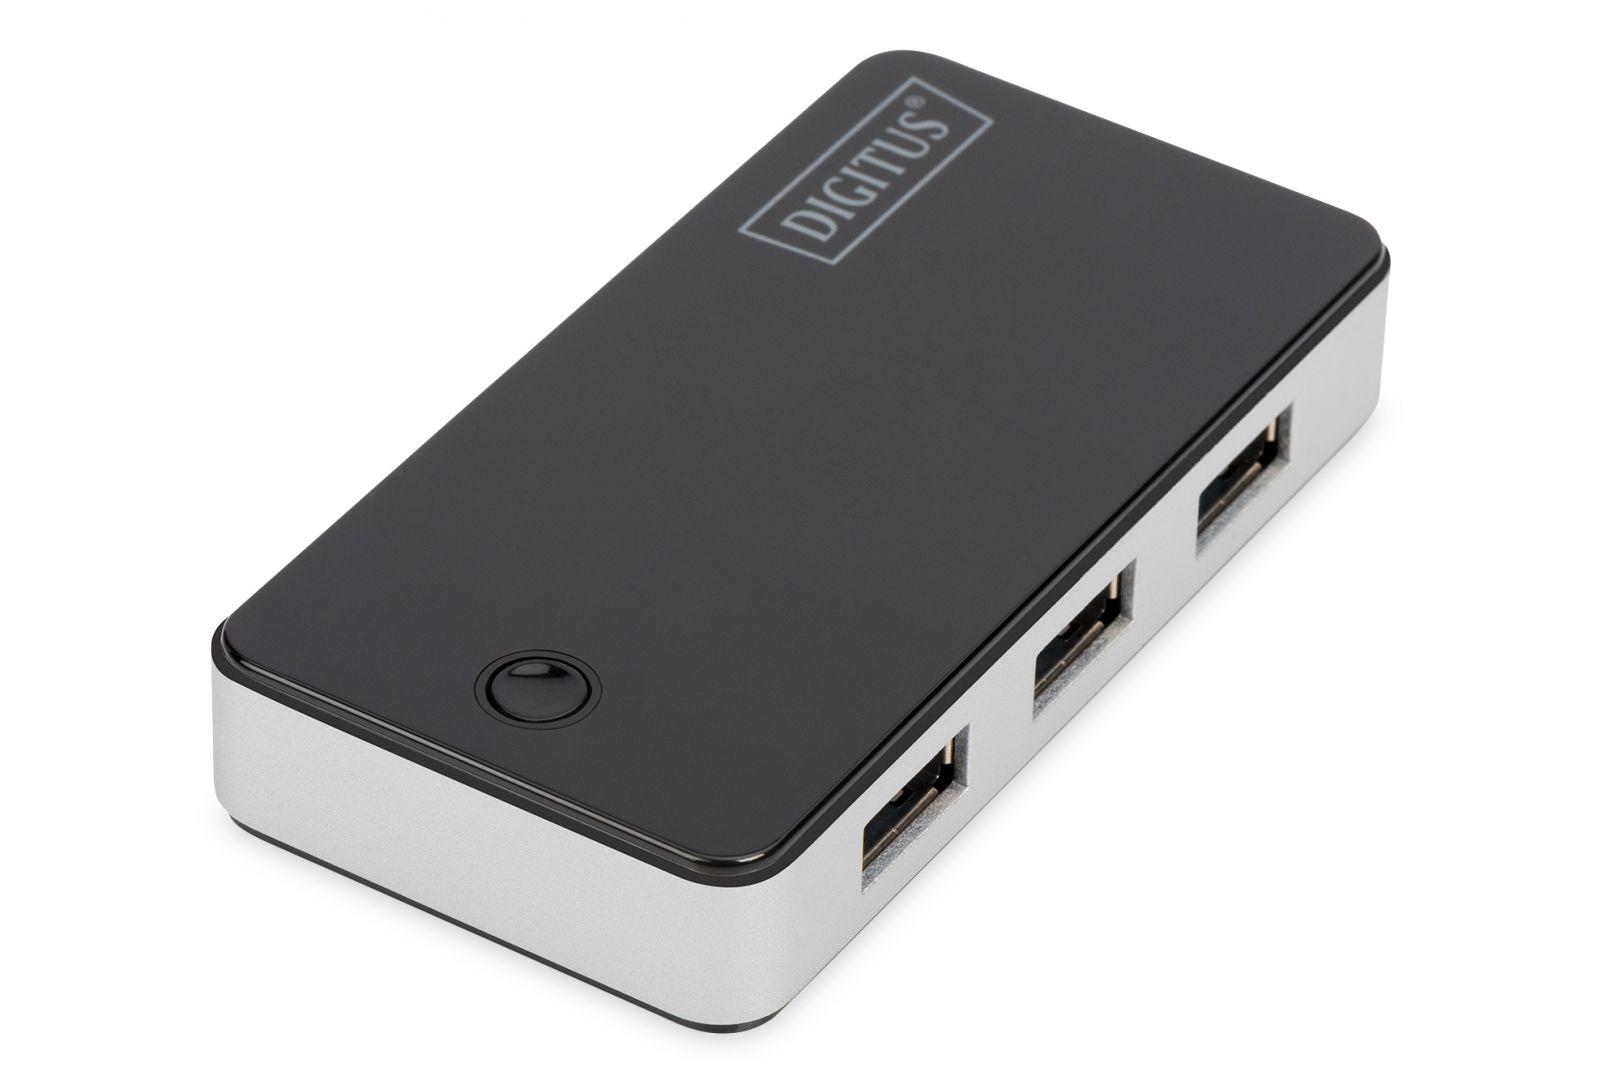 Digitus USB 3.0, 4-port HUB, 4xUSB A/F,1xUSB M/F (DA-70231)